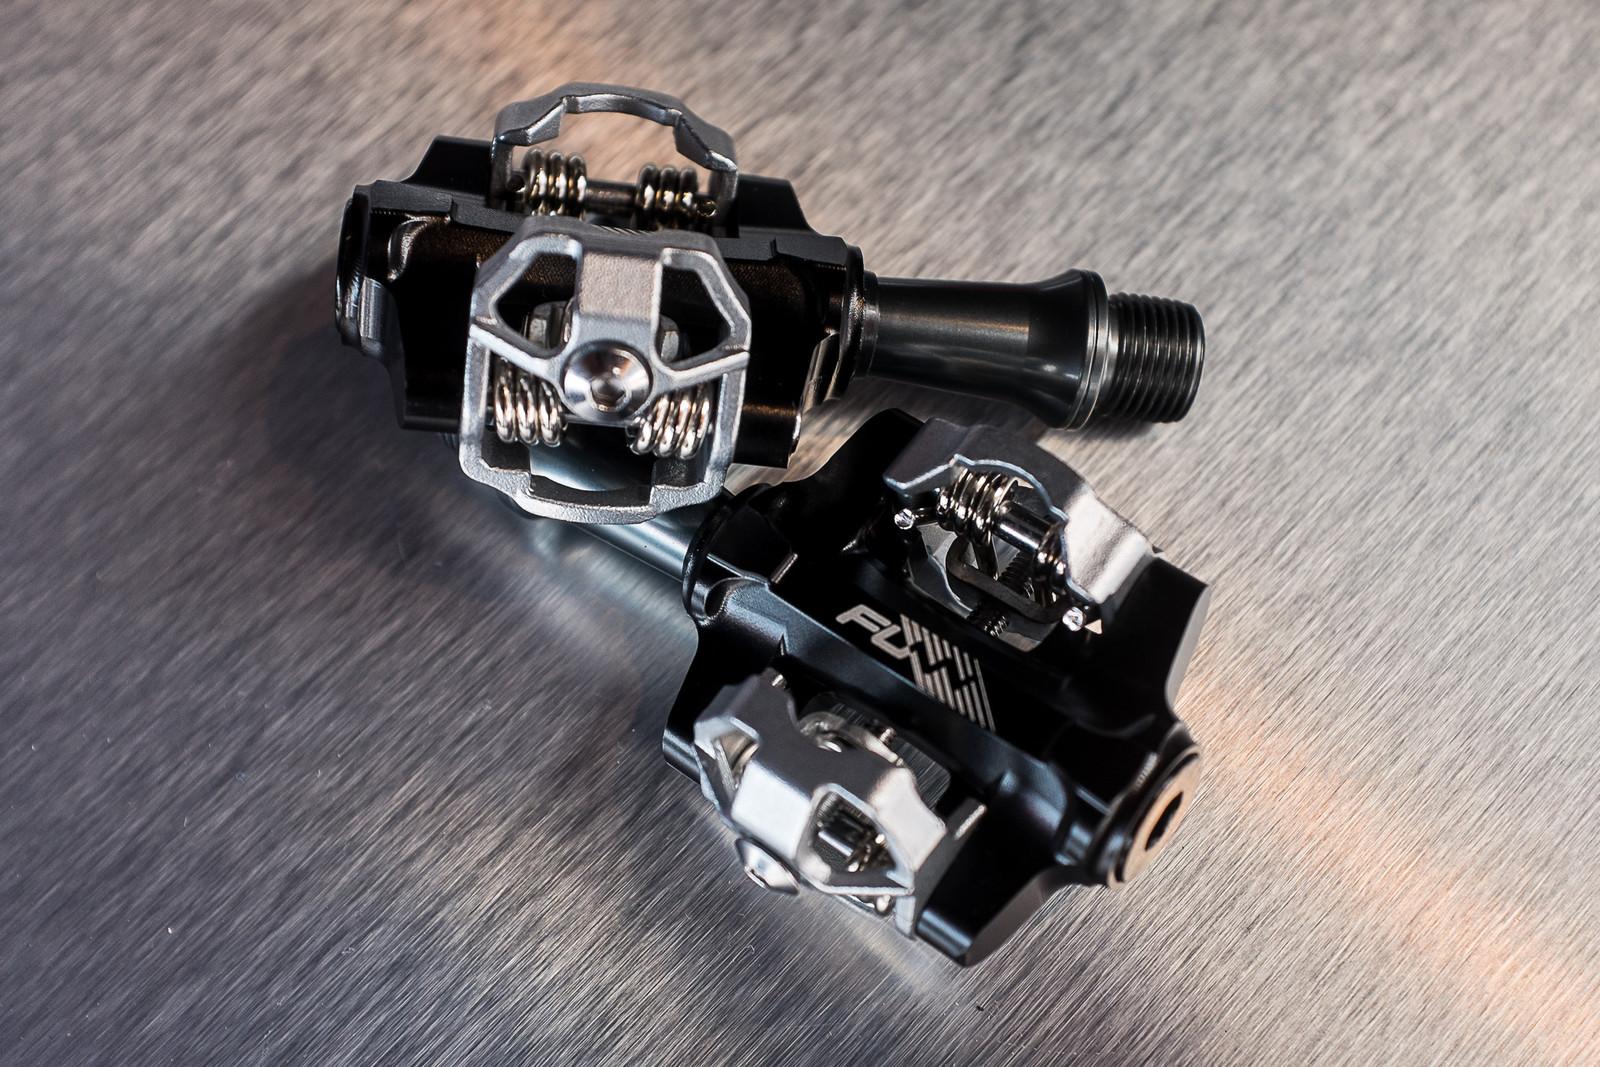 FUNN Prototype Alloy Axle Pedals - EUROBIKE - 2017 Mountain Bike Components - Mountain Biking Pictures - Vital MTB